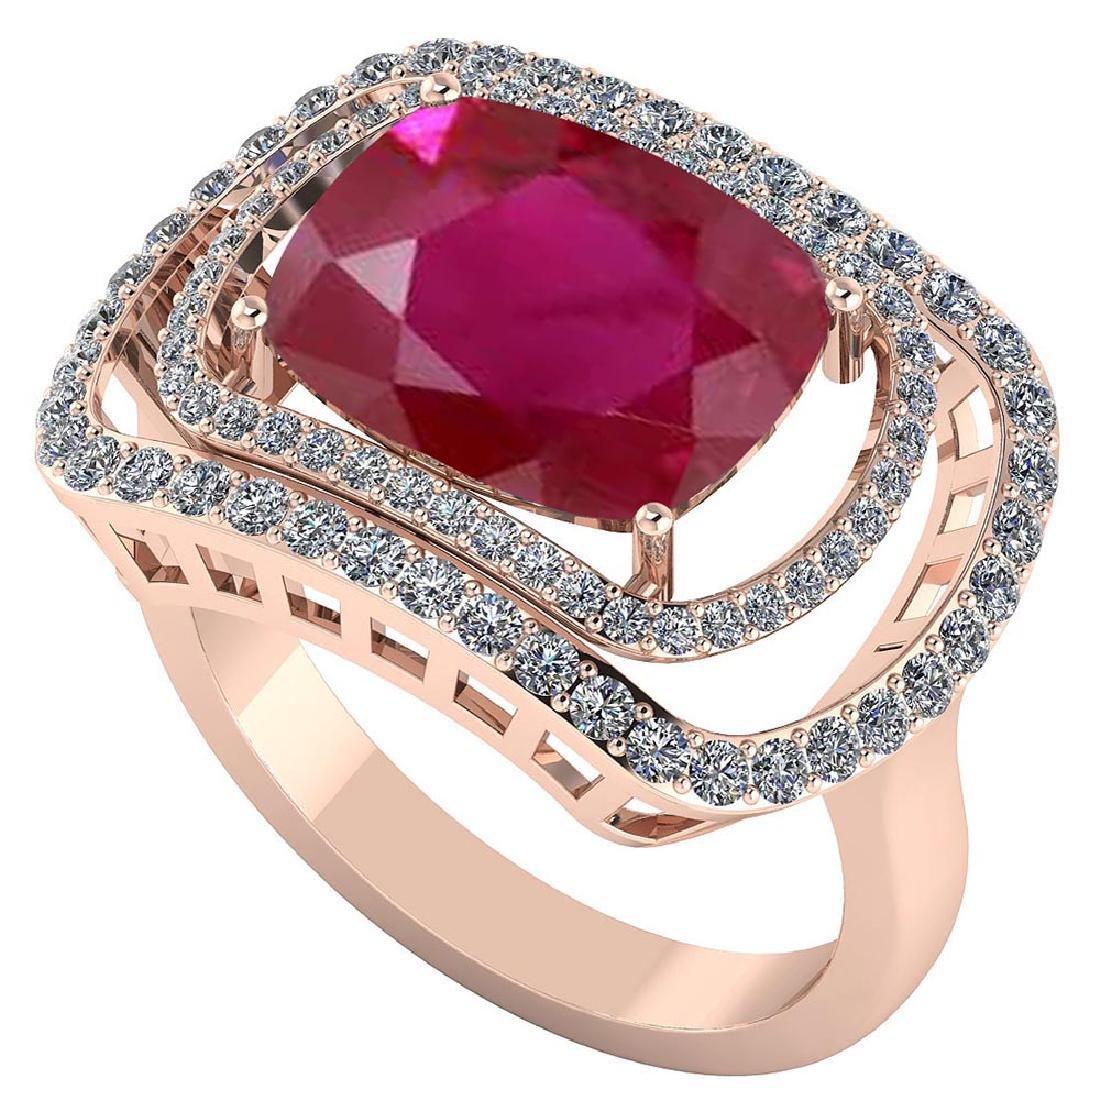 Certified 4.44 CTW Genuine Ruby And Diamond 14K Rose Go